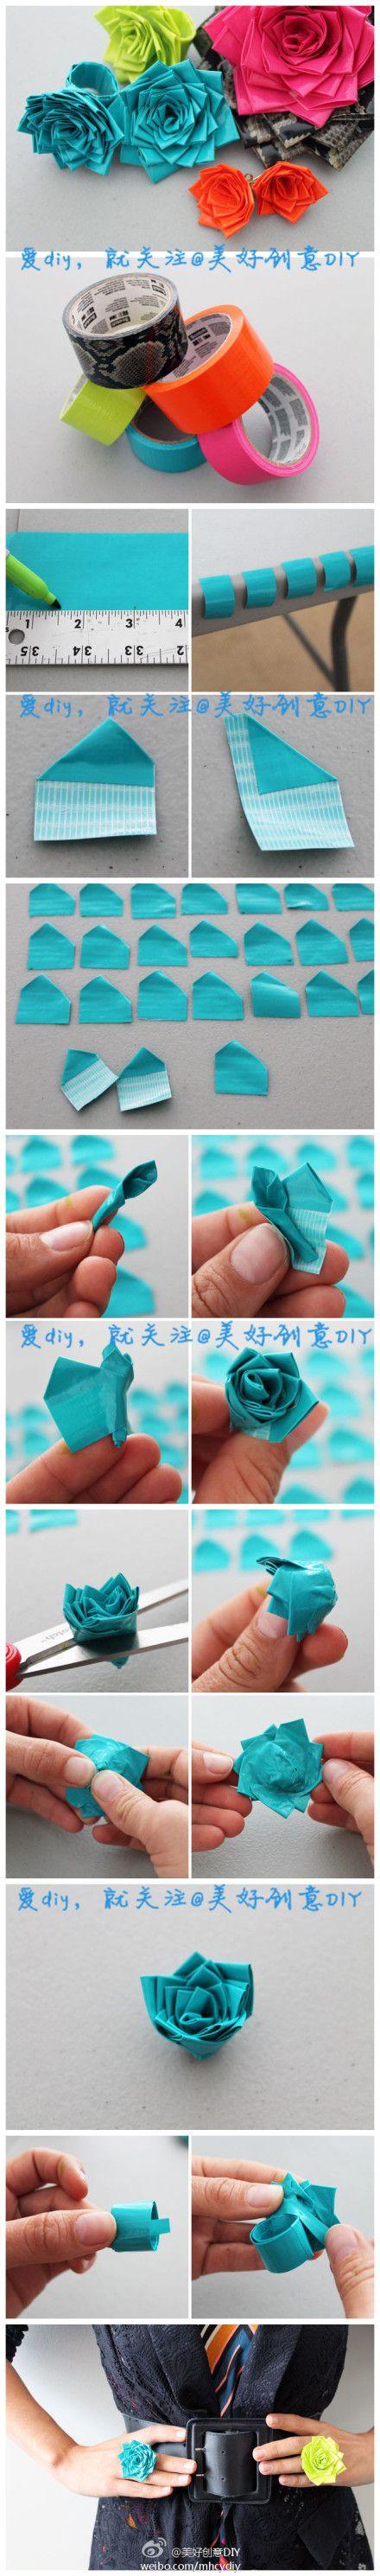 DIY duct tape flower ring